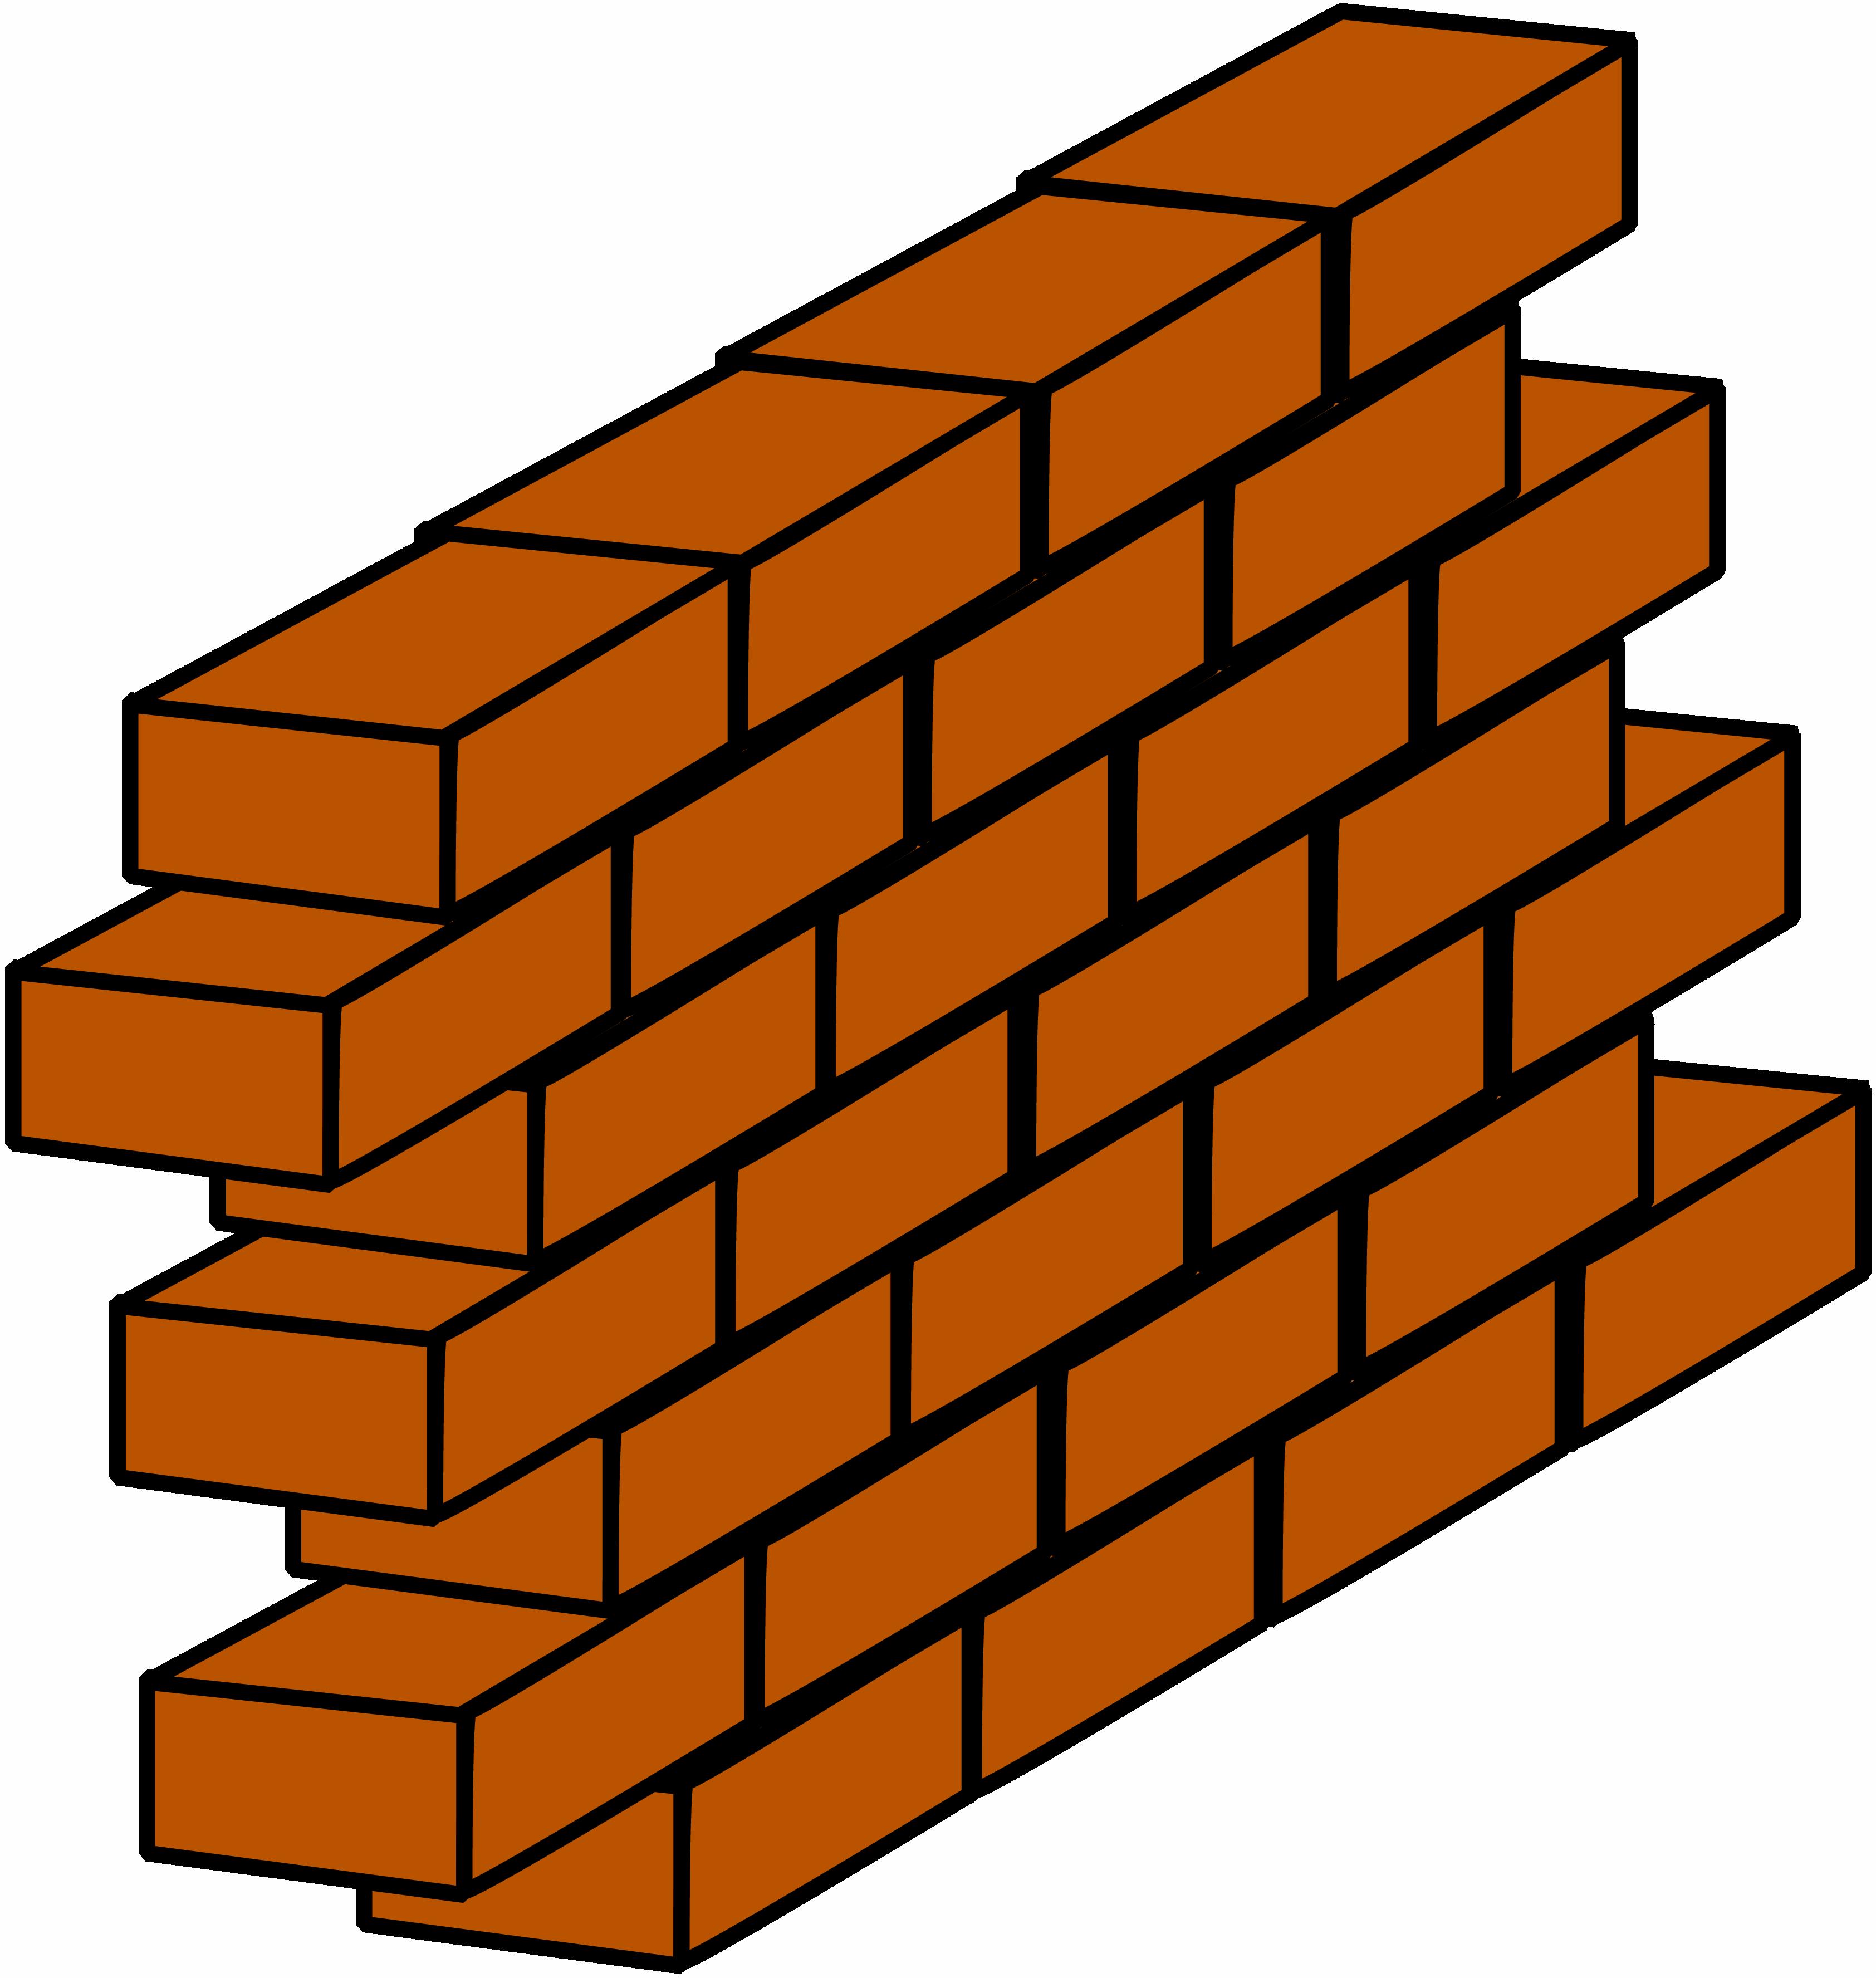 brick clip art free clipart panda free clipart images rh clipartpanda com brick clip art outline brick clipart black and white